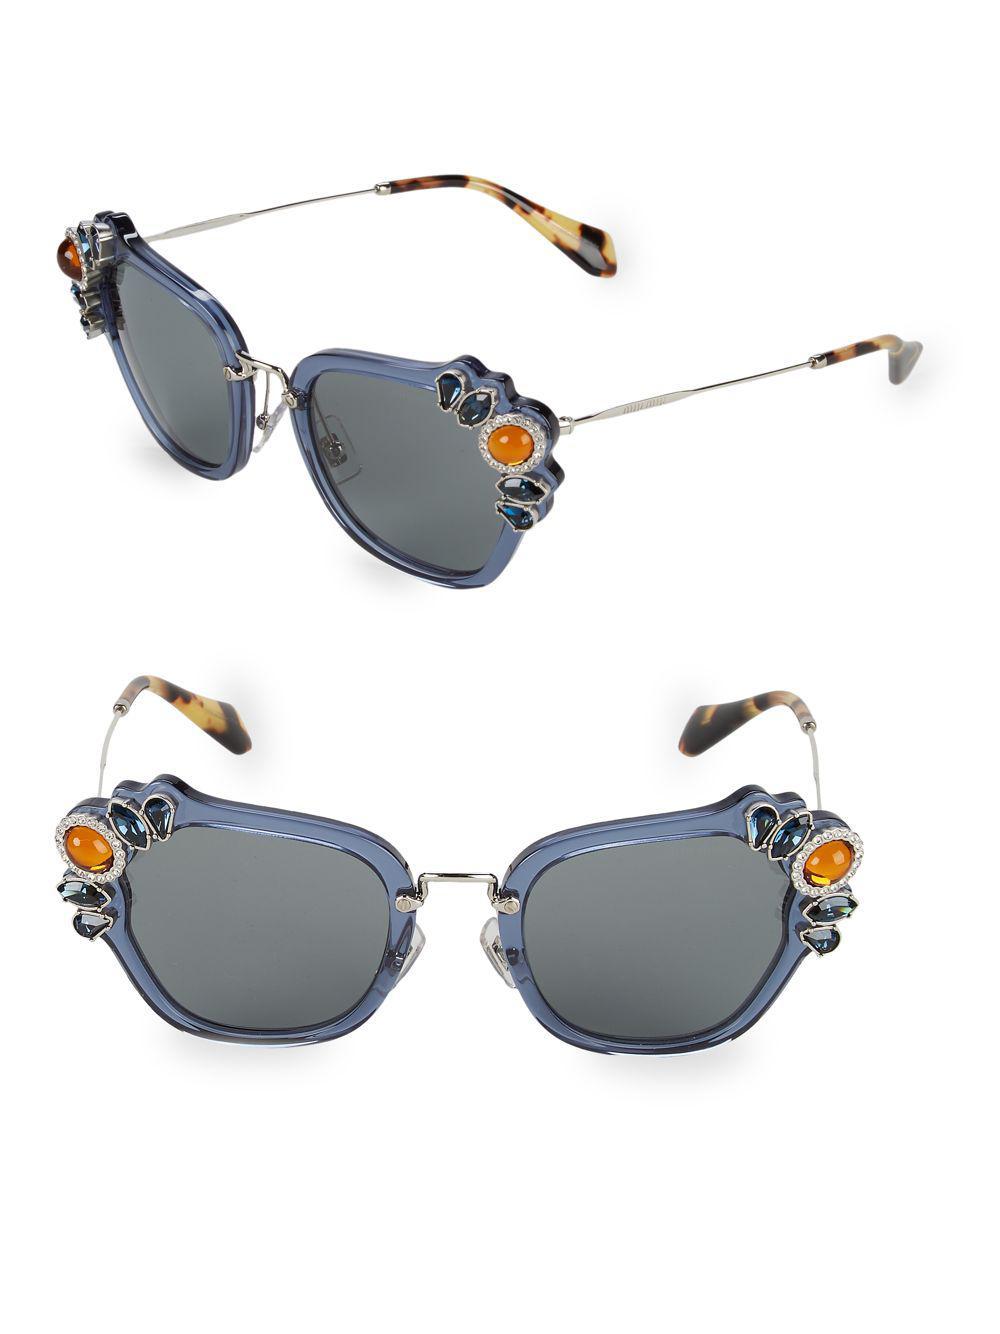 e936ccd9458 Lyst - Miu Miu Crystal Embellished 51mm Cateye Sunglasses in Blue